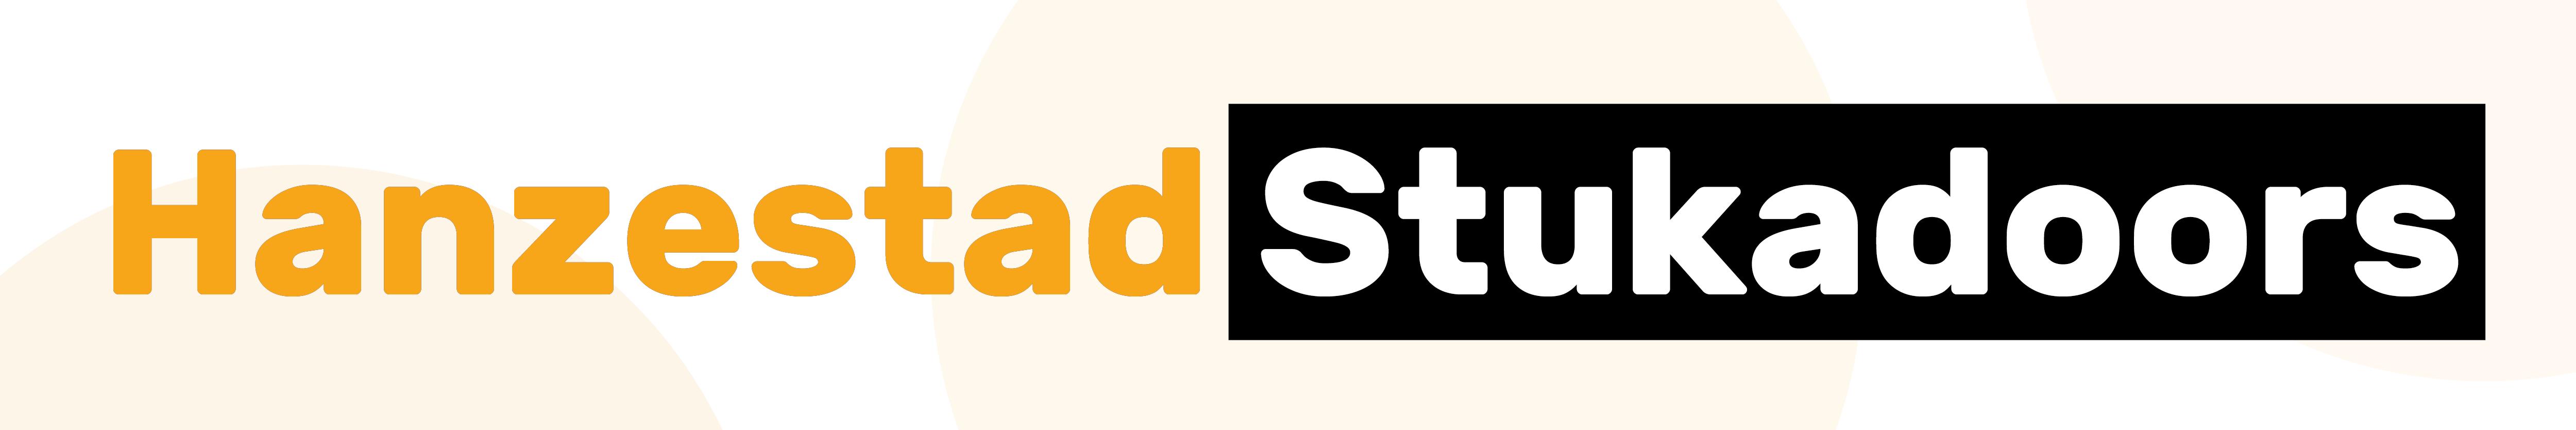 Hanzestad Stukadoors